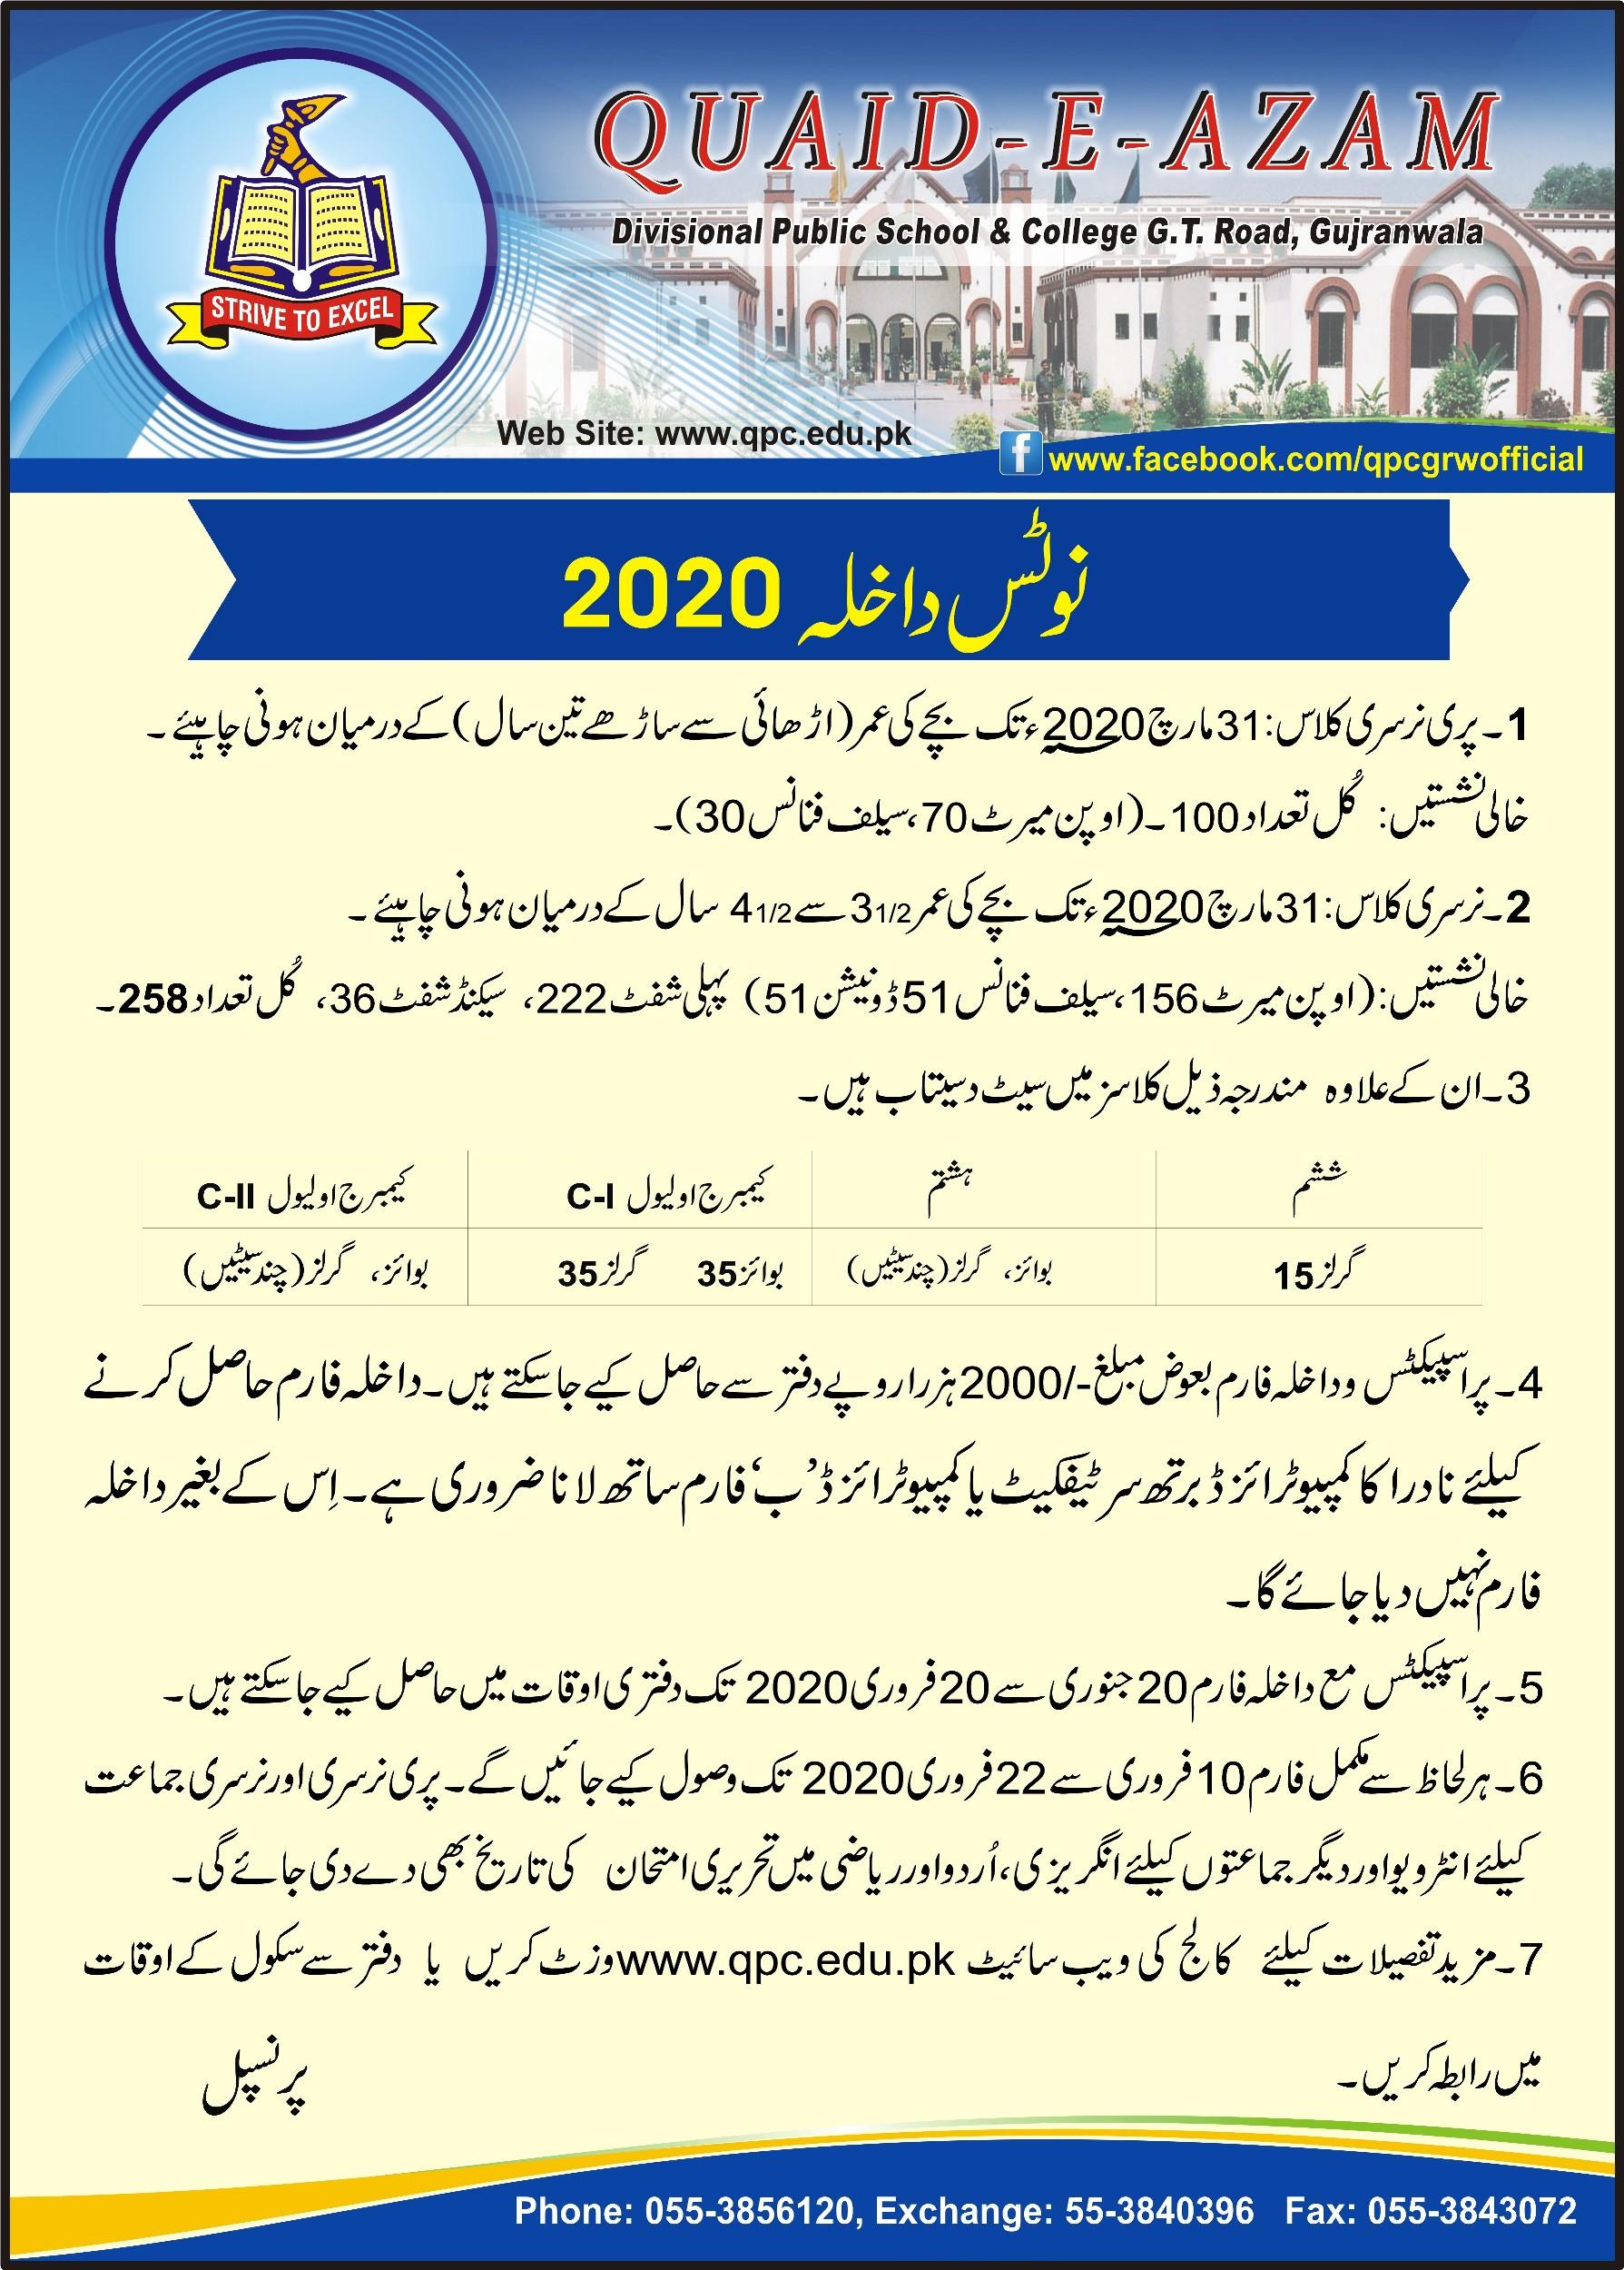 Quaid e Azam Divisional Public School & College Gujranwala Admission 2020